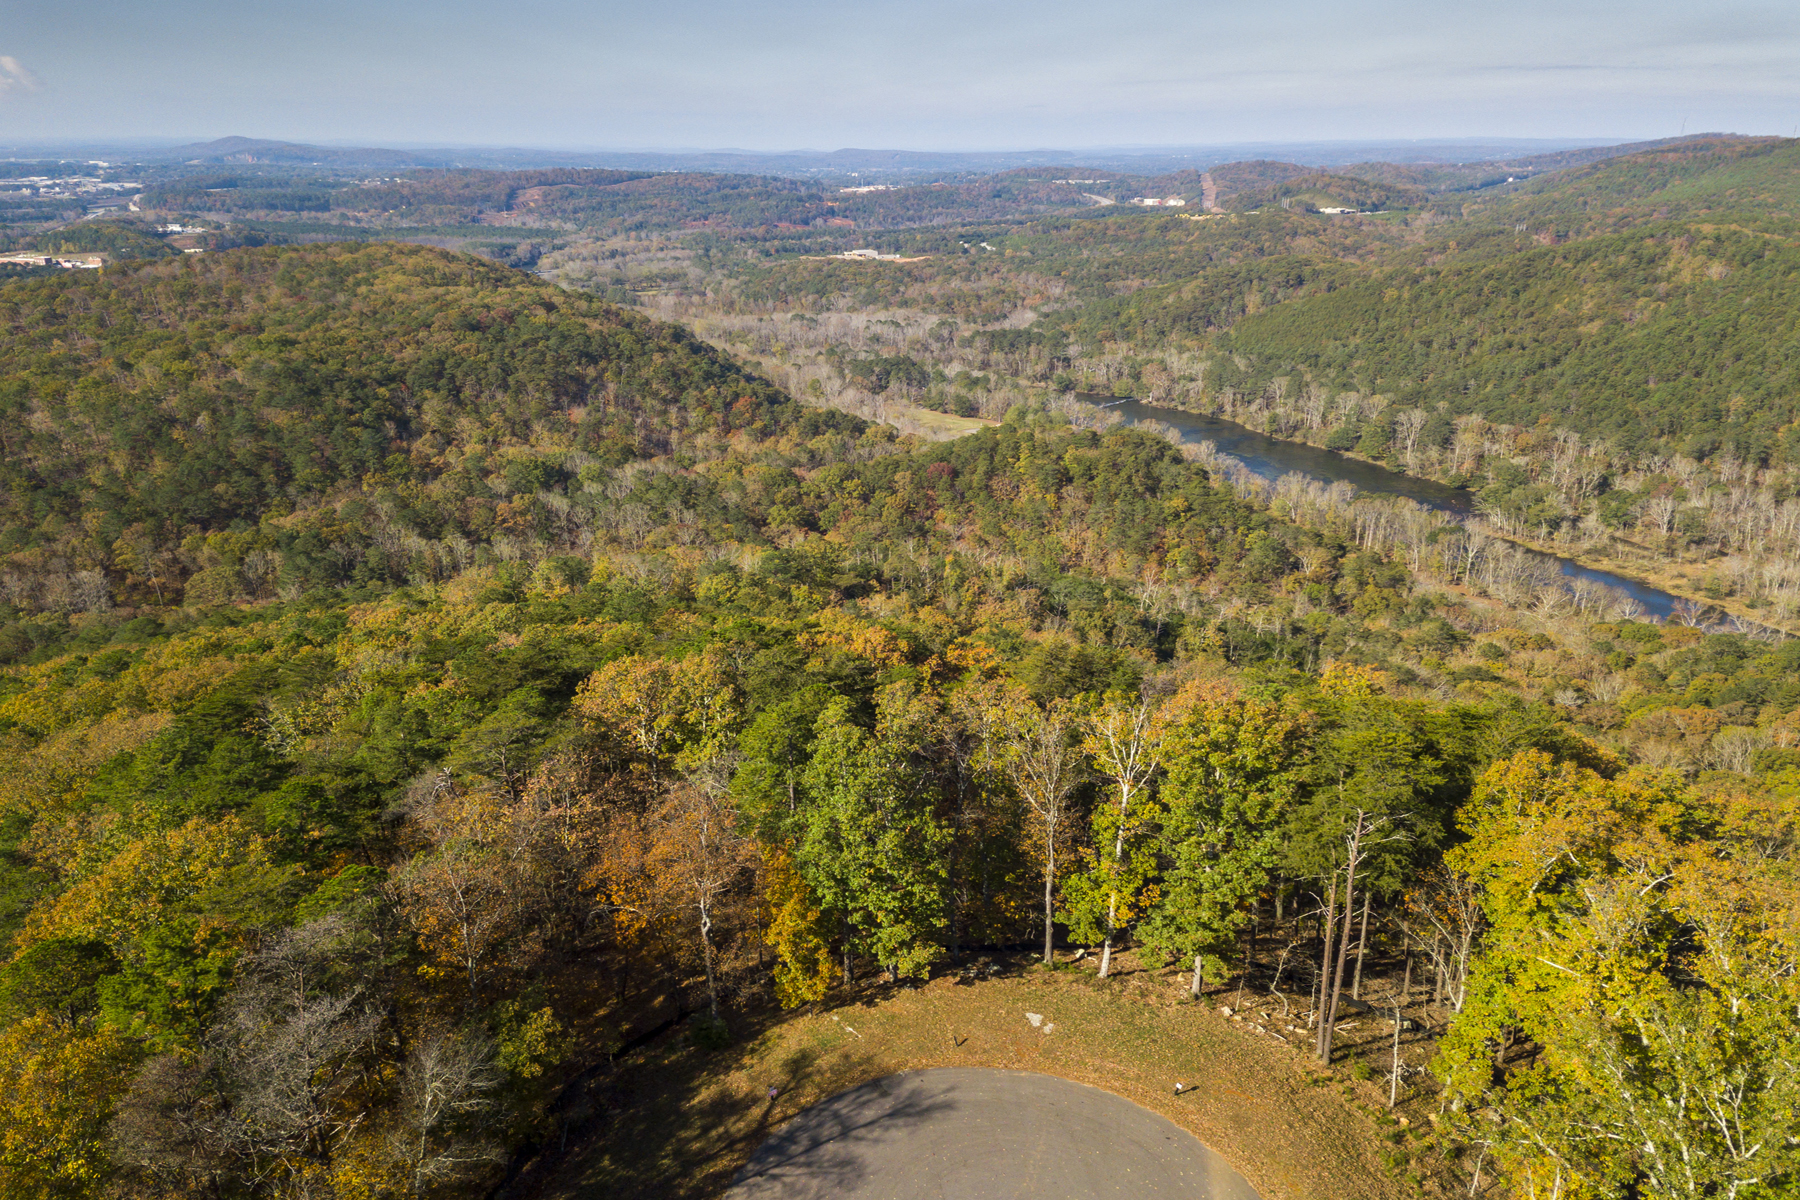 土地 为 销售 在 Fabulous 2+ Acre Cul-de-sac Lot with Big Views of Lake Allatoona and Mountains 110 Somerset Lane, 卡特斯维尔, 乔治亚州, 30121 美国